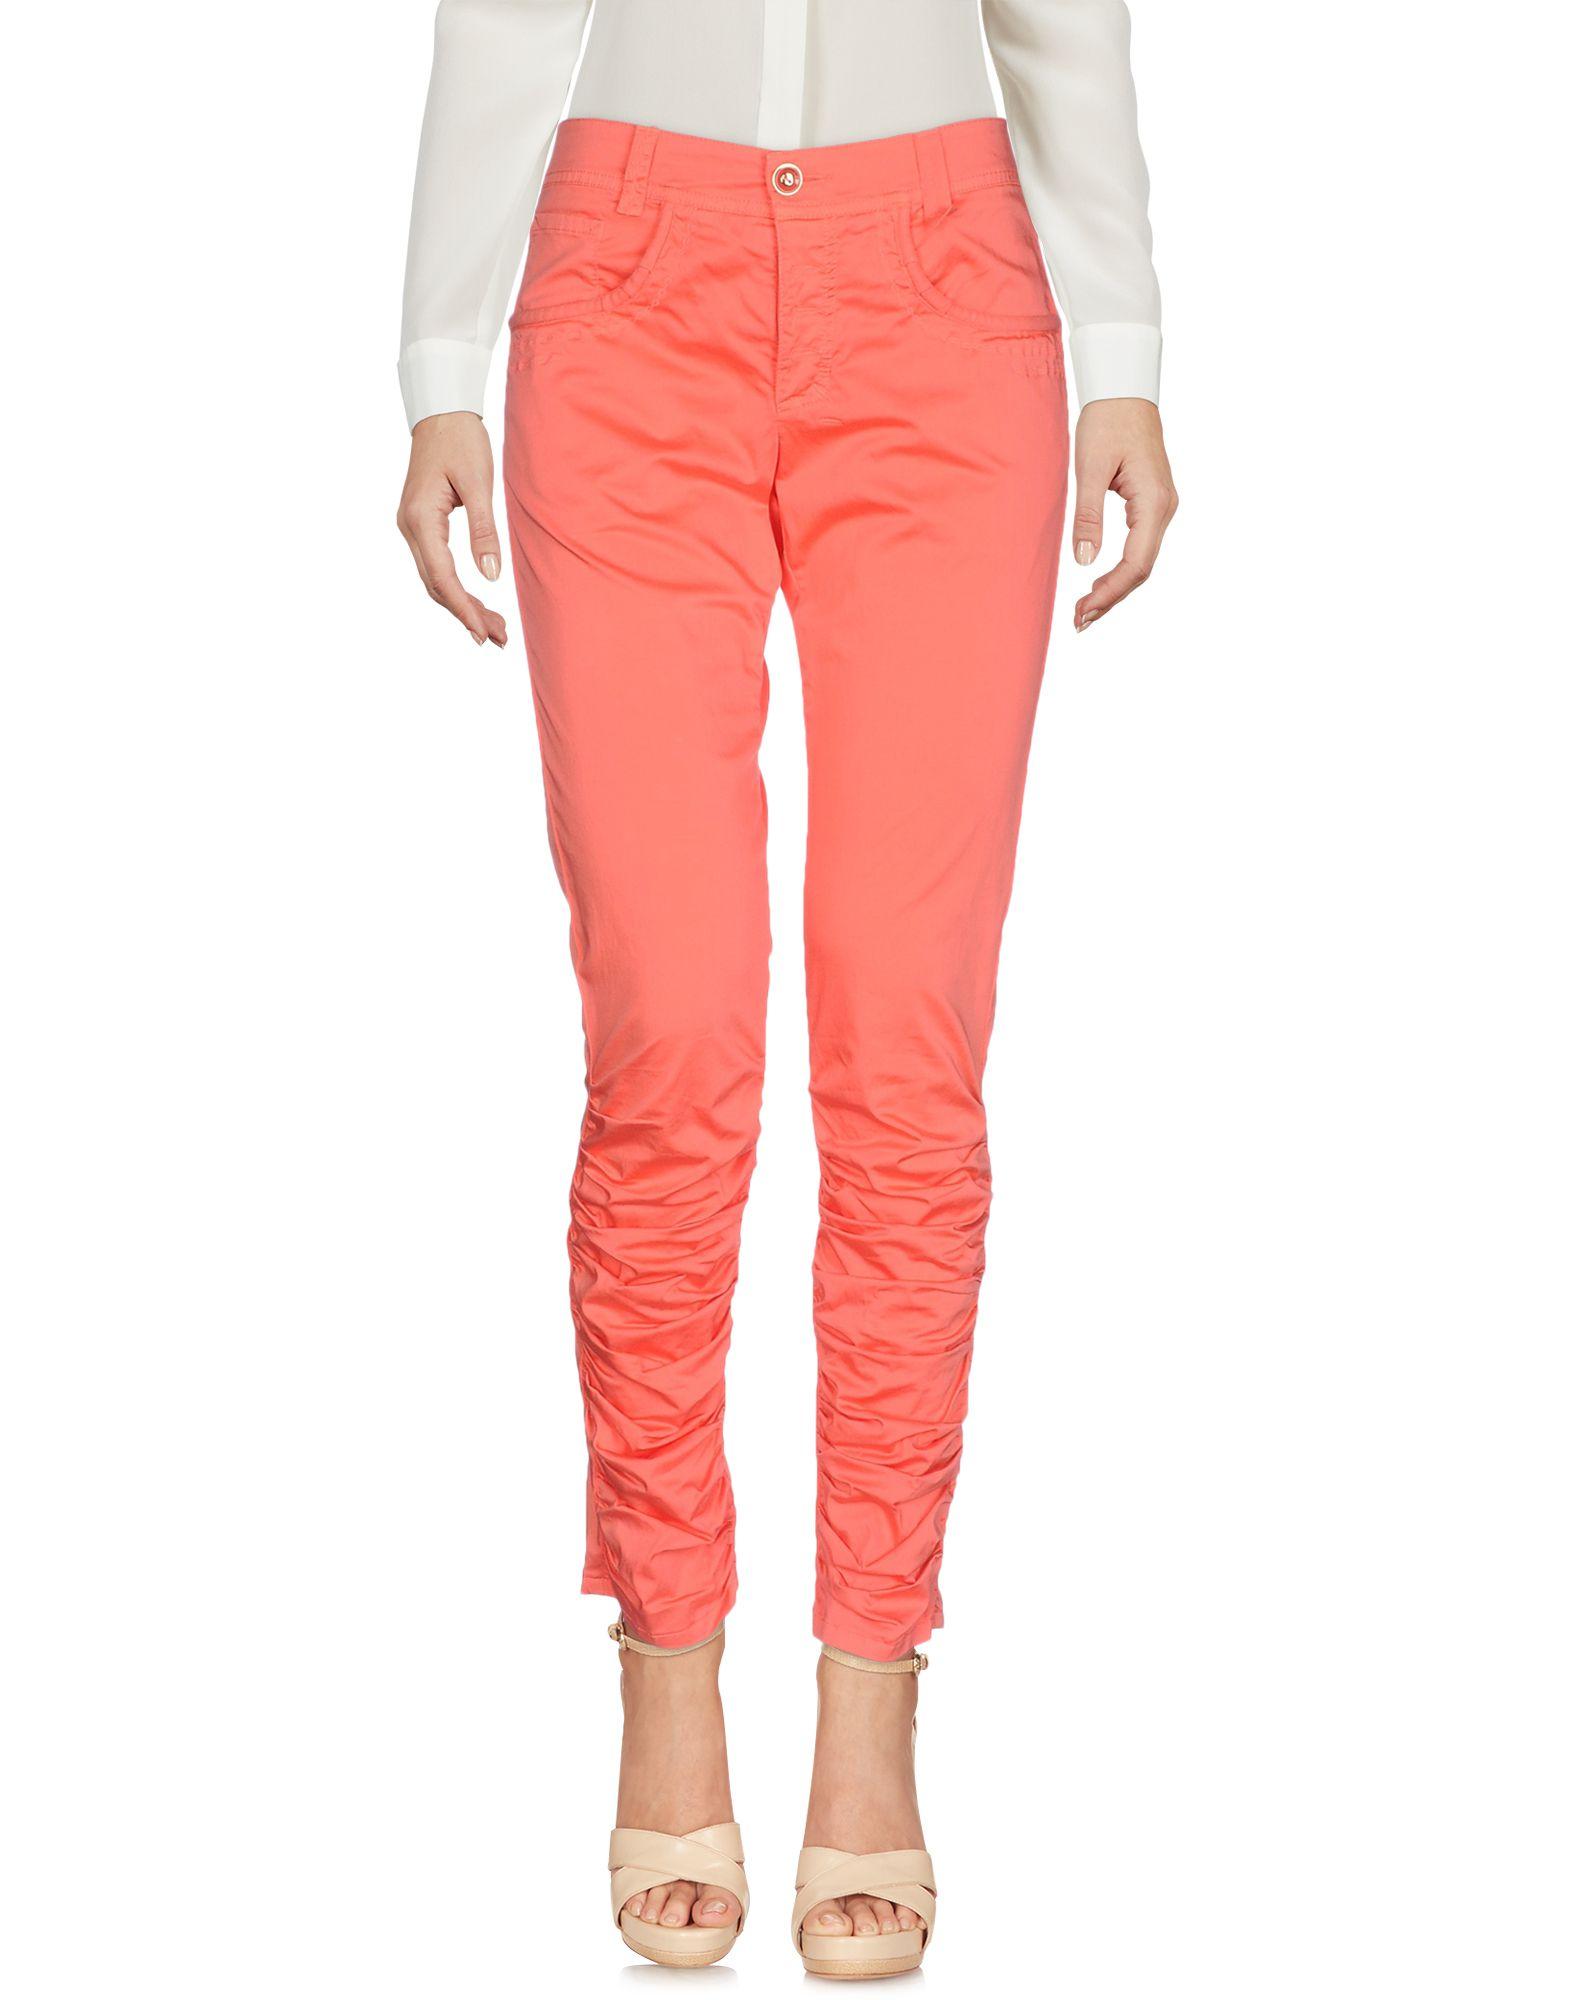 Pantalone Pantalone Annarita N donna - 13156375NG  Markenverkauf